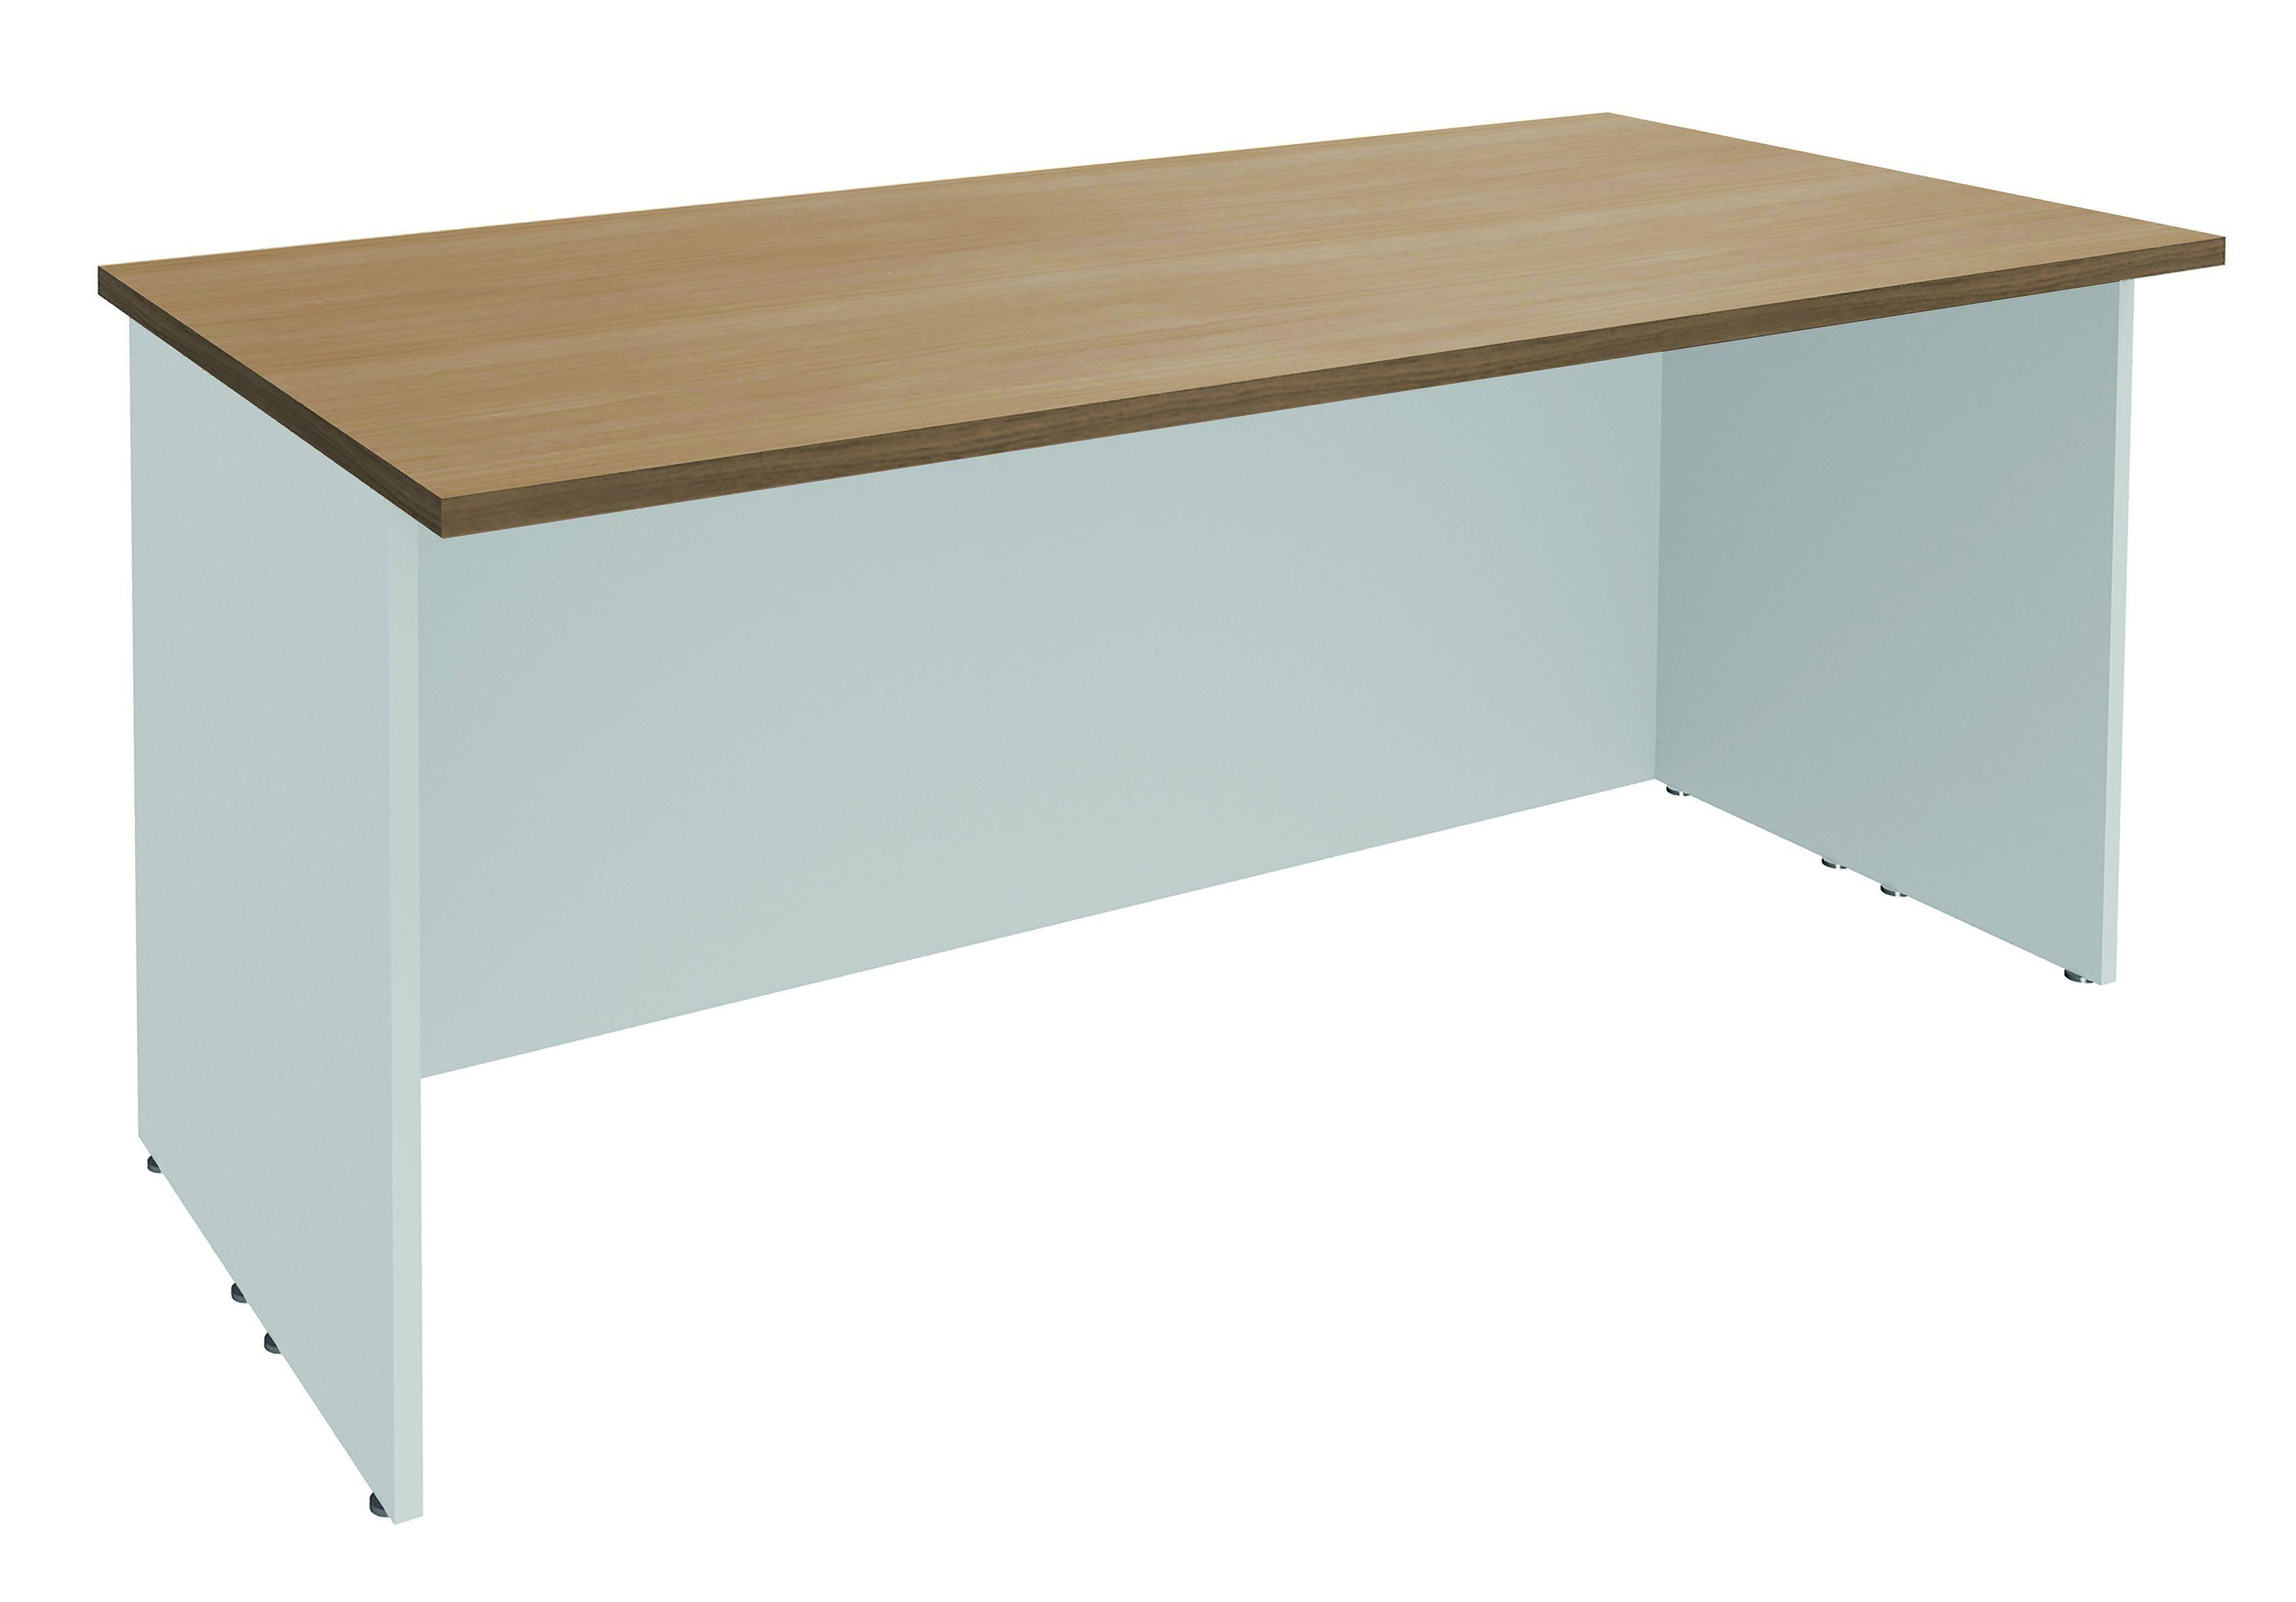 Banque d'accueil LUMINA - sans réhausse - L160 x H75 x P80 cm - Finition chêne clair/blanc